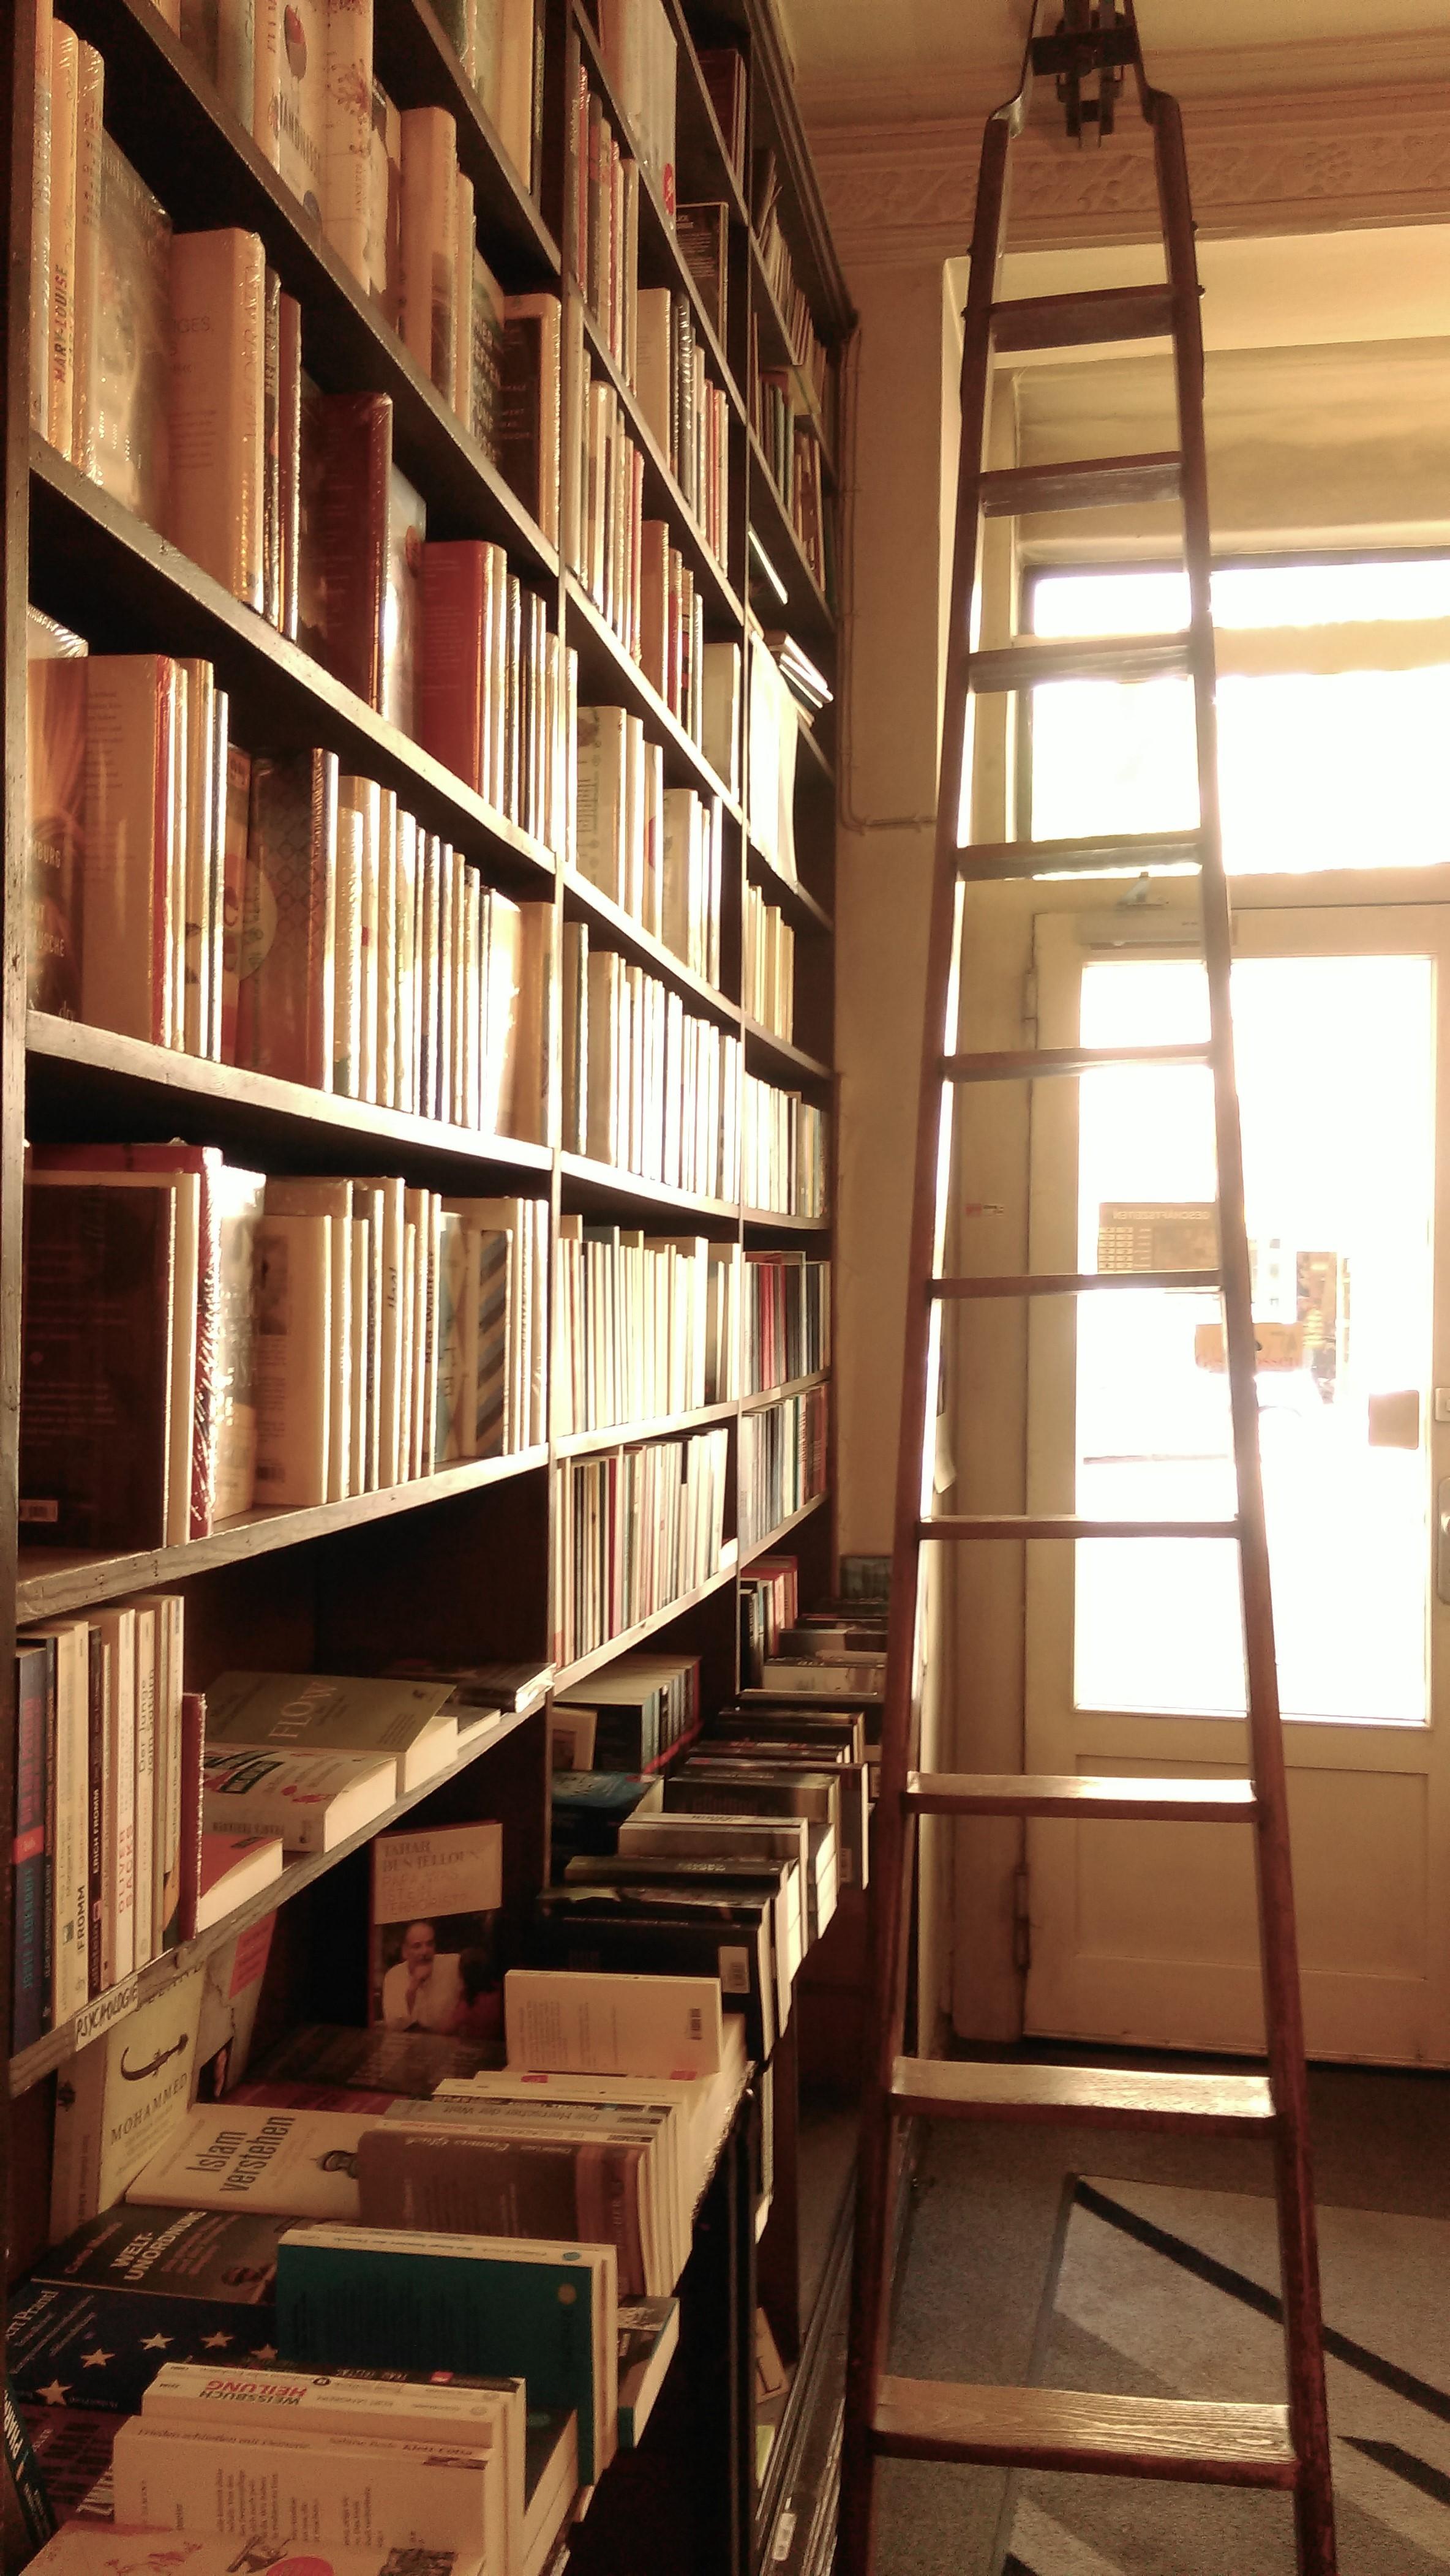 Buchhandlung Auerbach